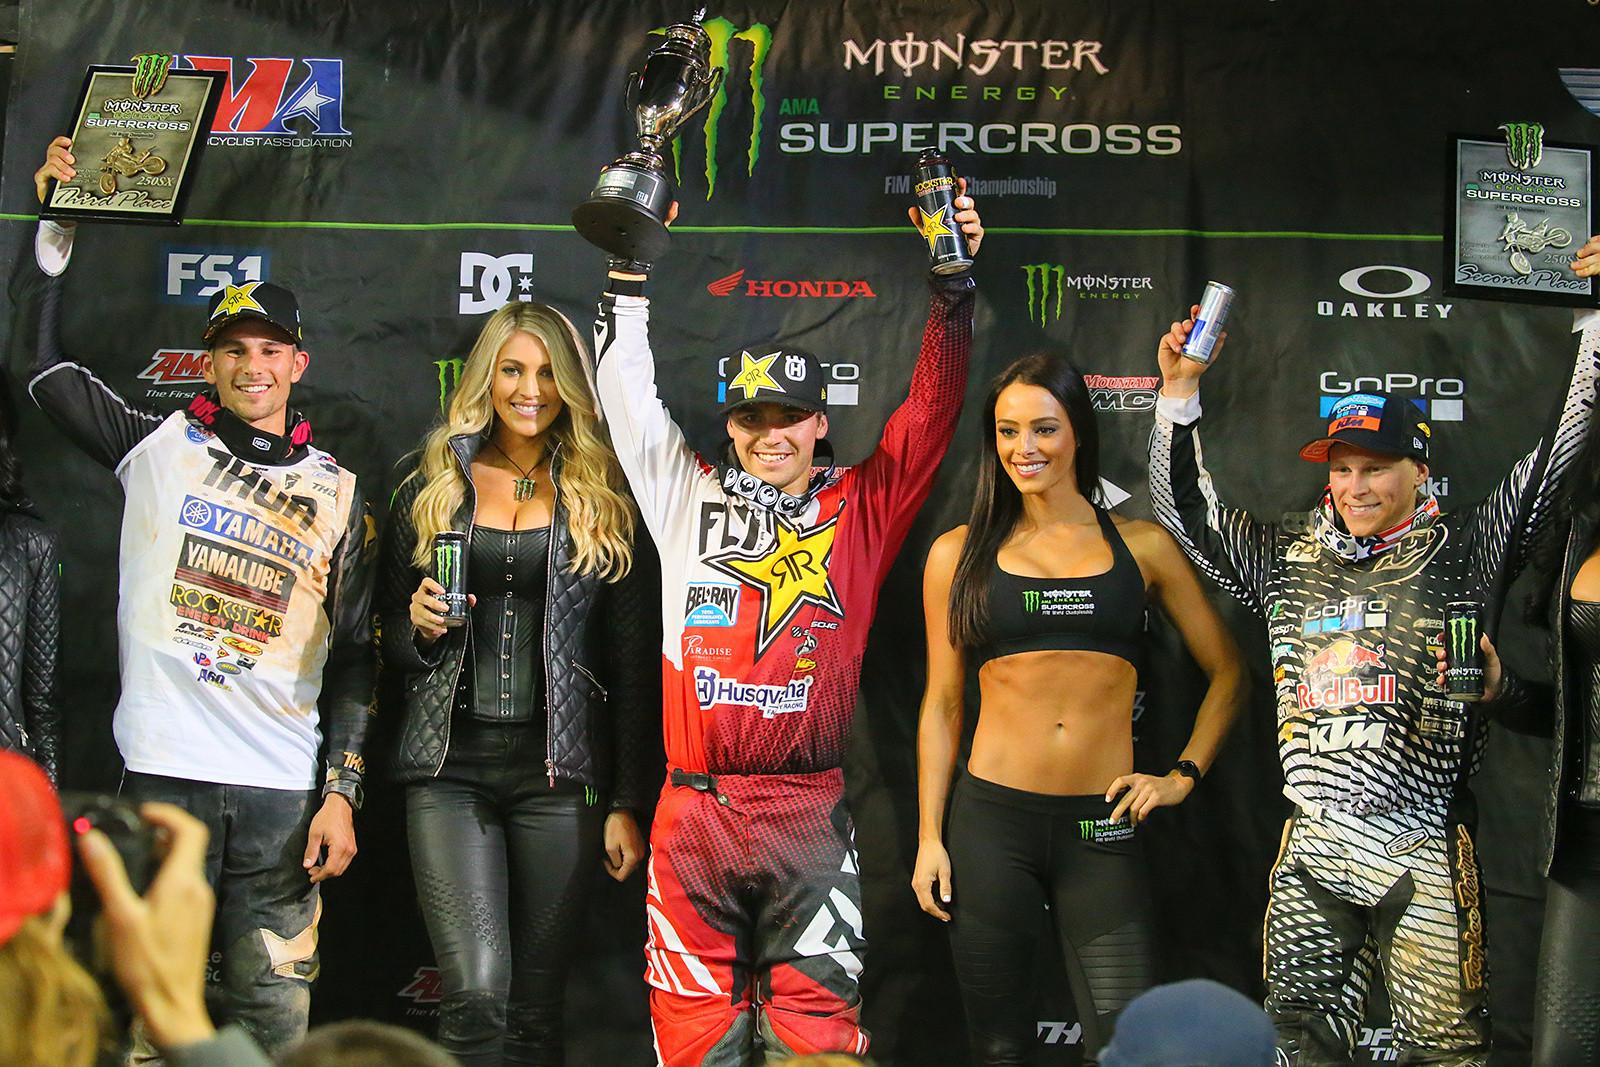 Zach Osborne (1st), Alex Martin (2nd), and Colt Nichols (3rd) - Photo Blast: Atlanta Supercross - Motocross Pictures - Vital MX